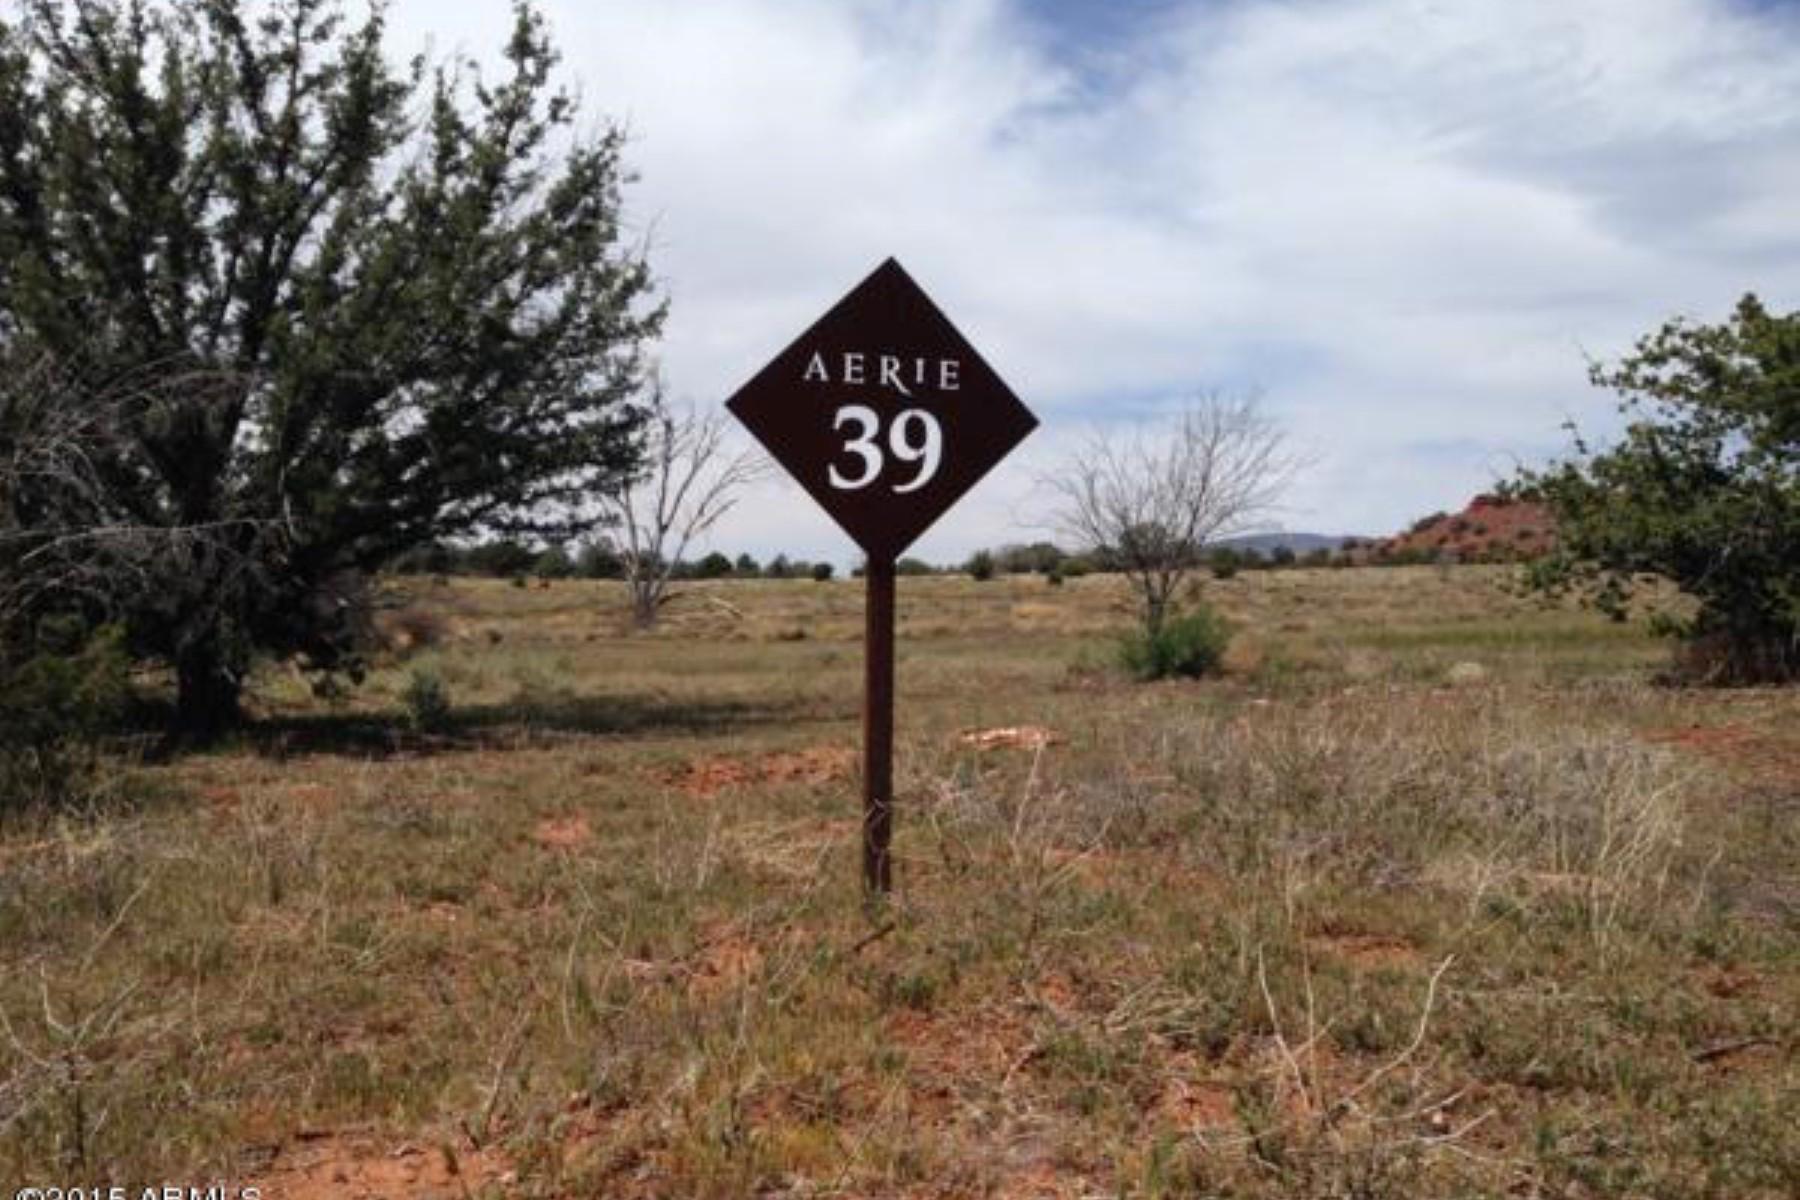 Đất đai vì Bán tại Aerie Lot 39 - Central 2.6 acre lot with expansive views of Doe Mountain. 60 Altair AVE 39 Sedona, Arizona 86336 Hoa Kỳ